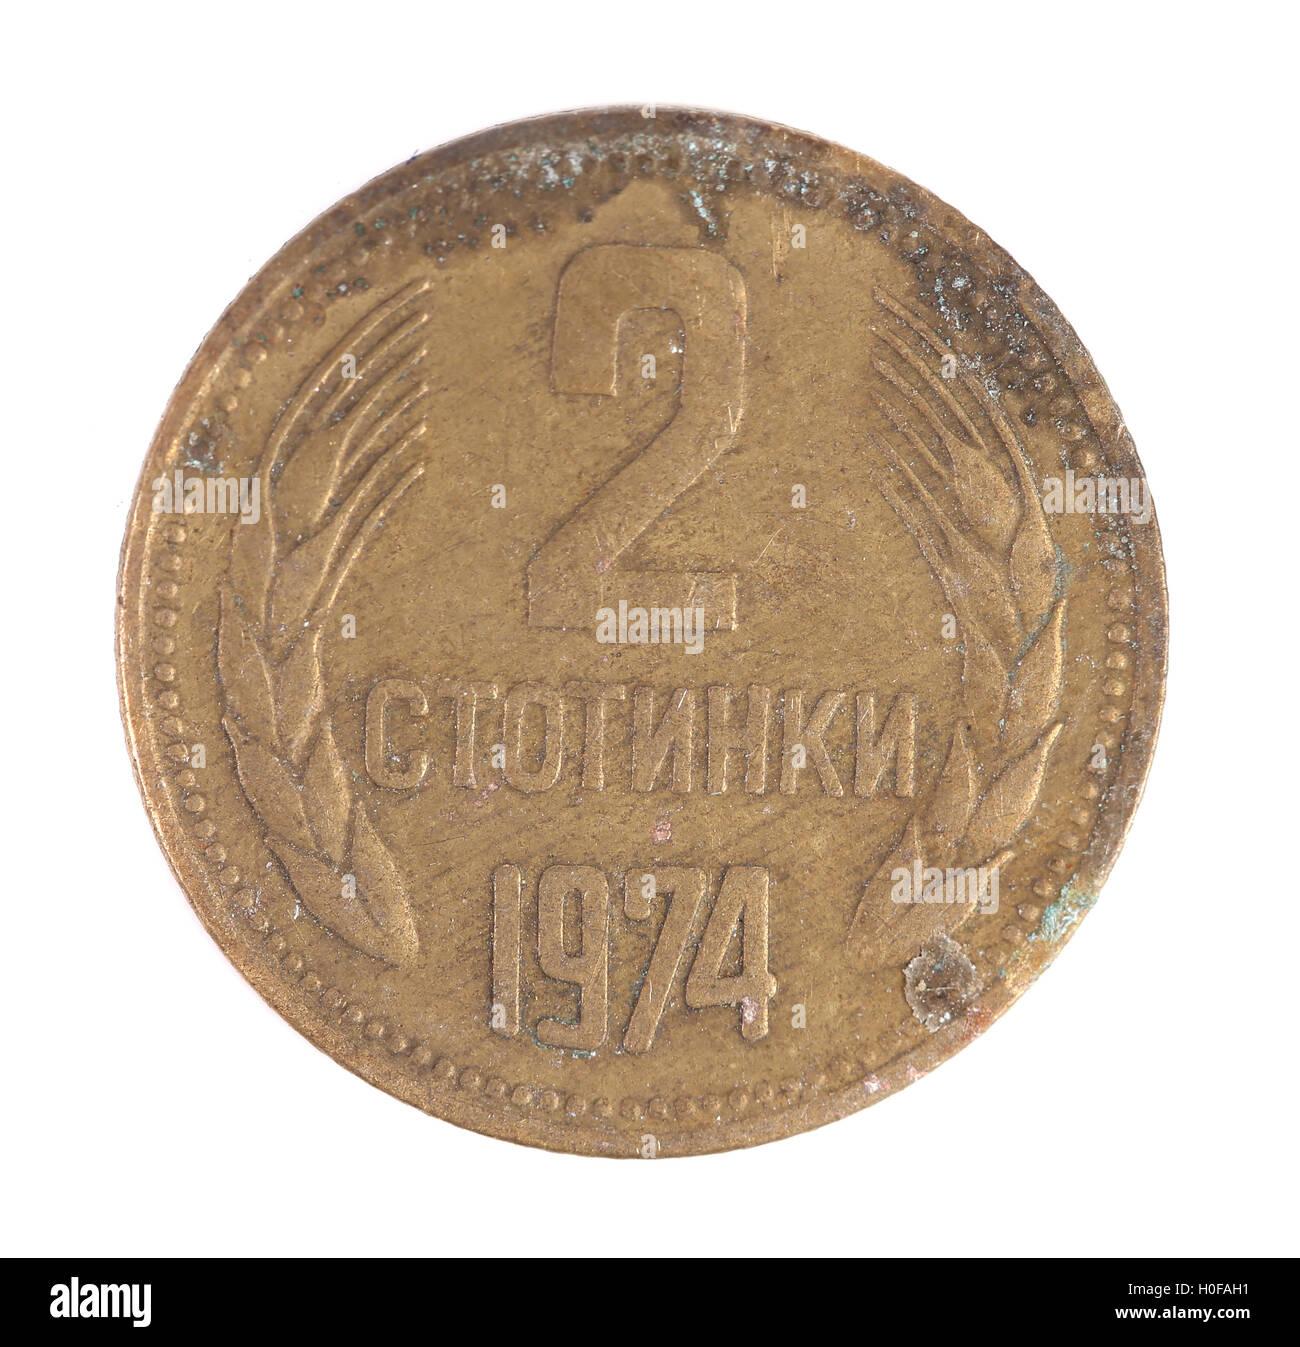 USSR 2 kopek coin. - Stock Image